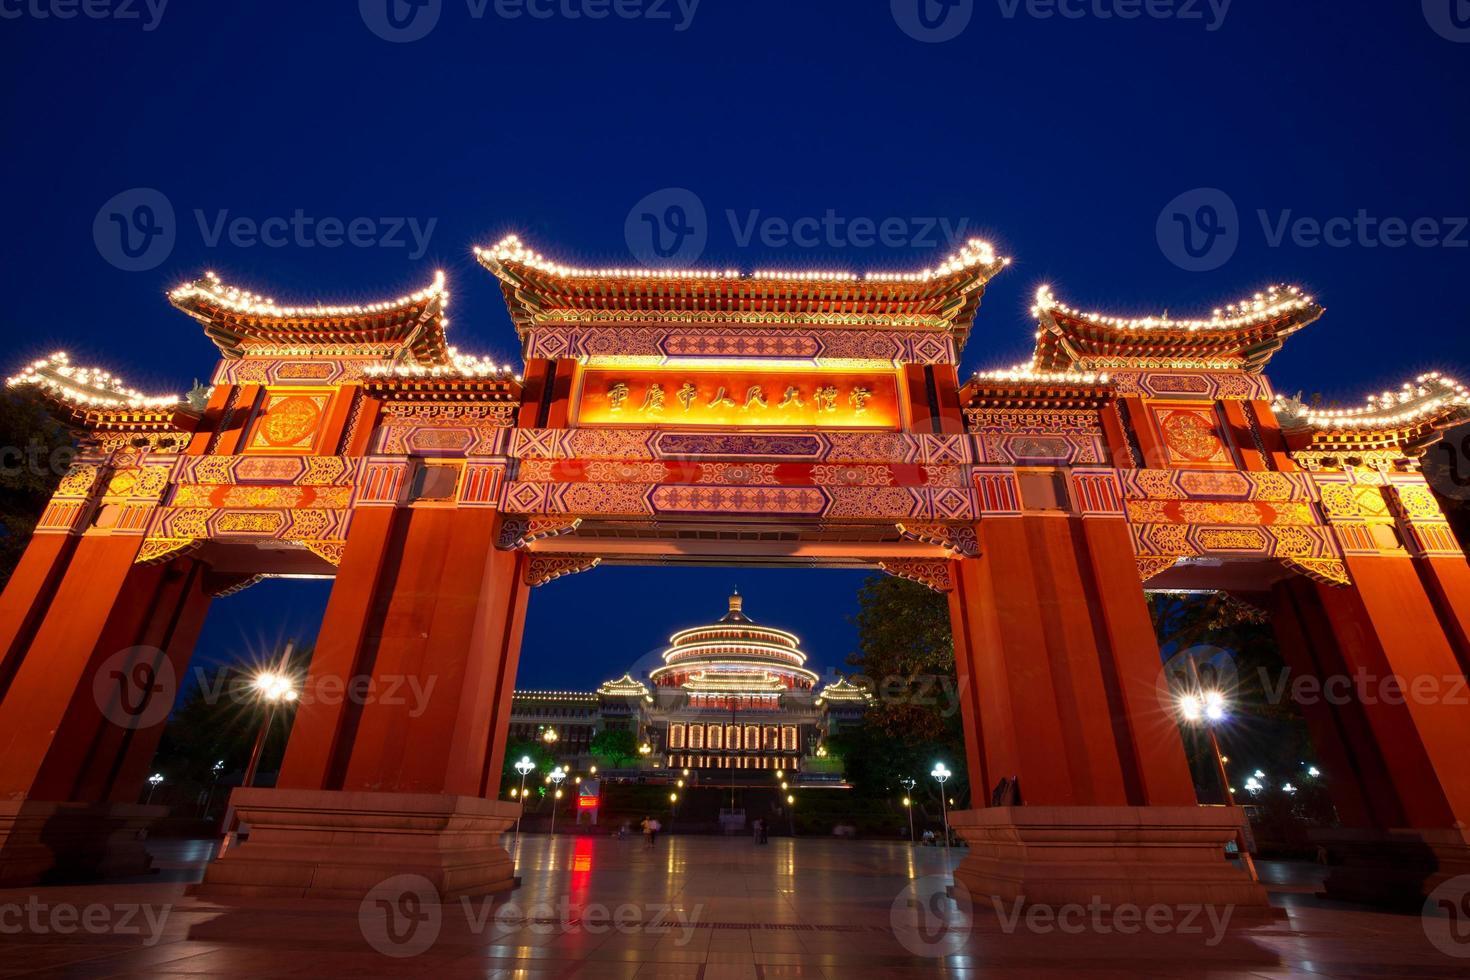 boog poort en grote zaal nachtscène, chongqing, china foto